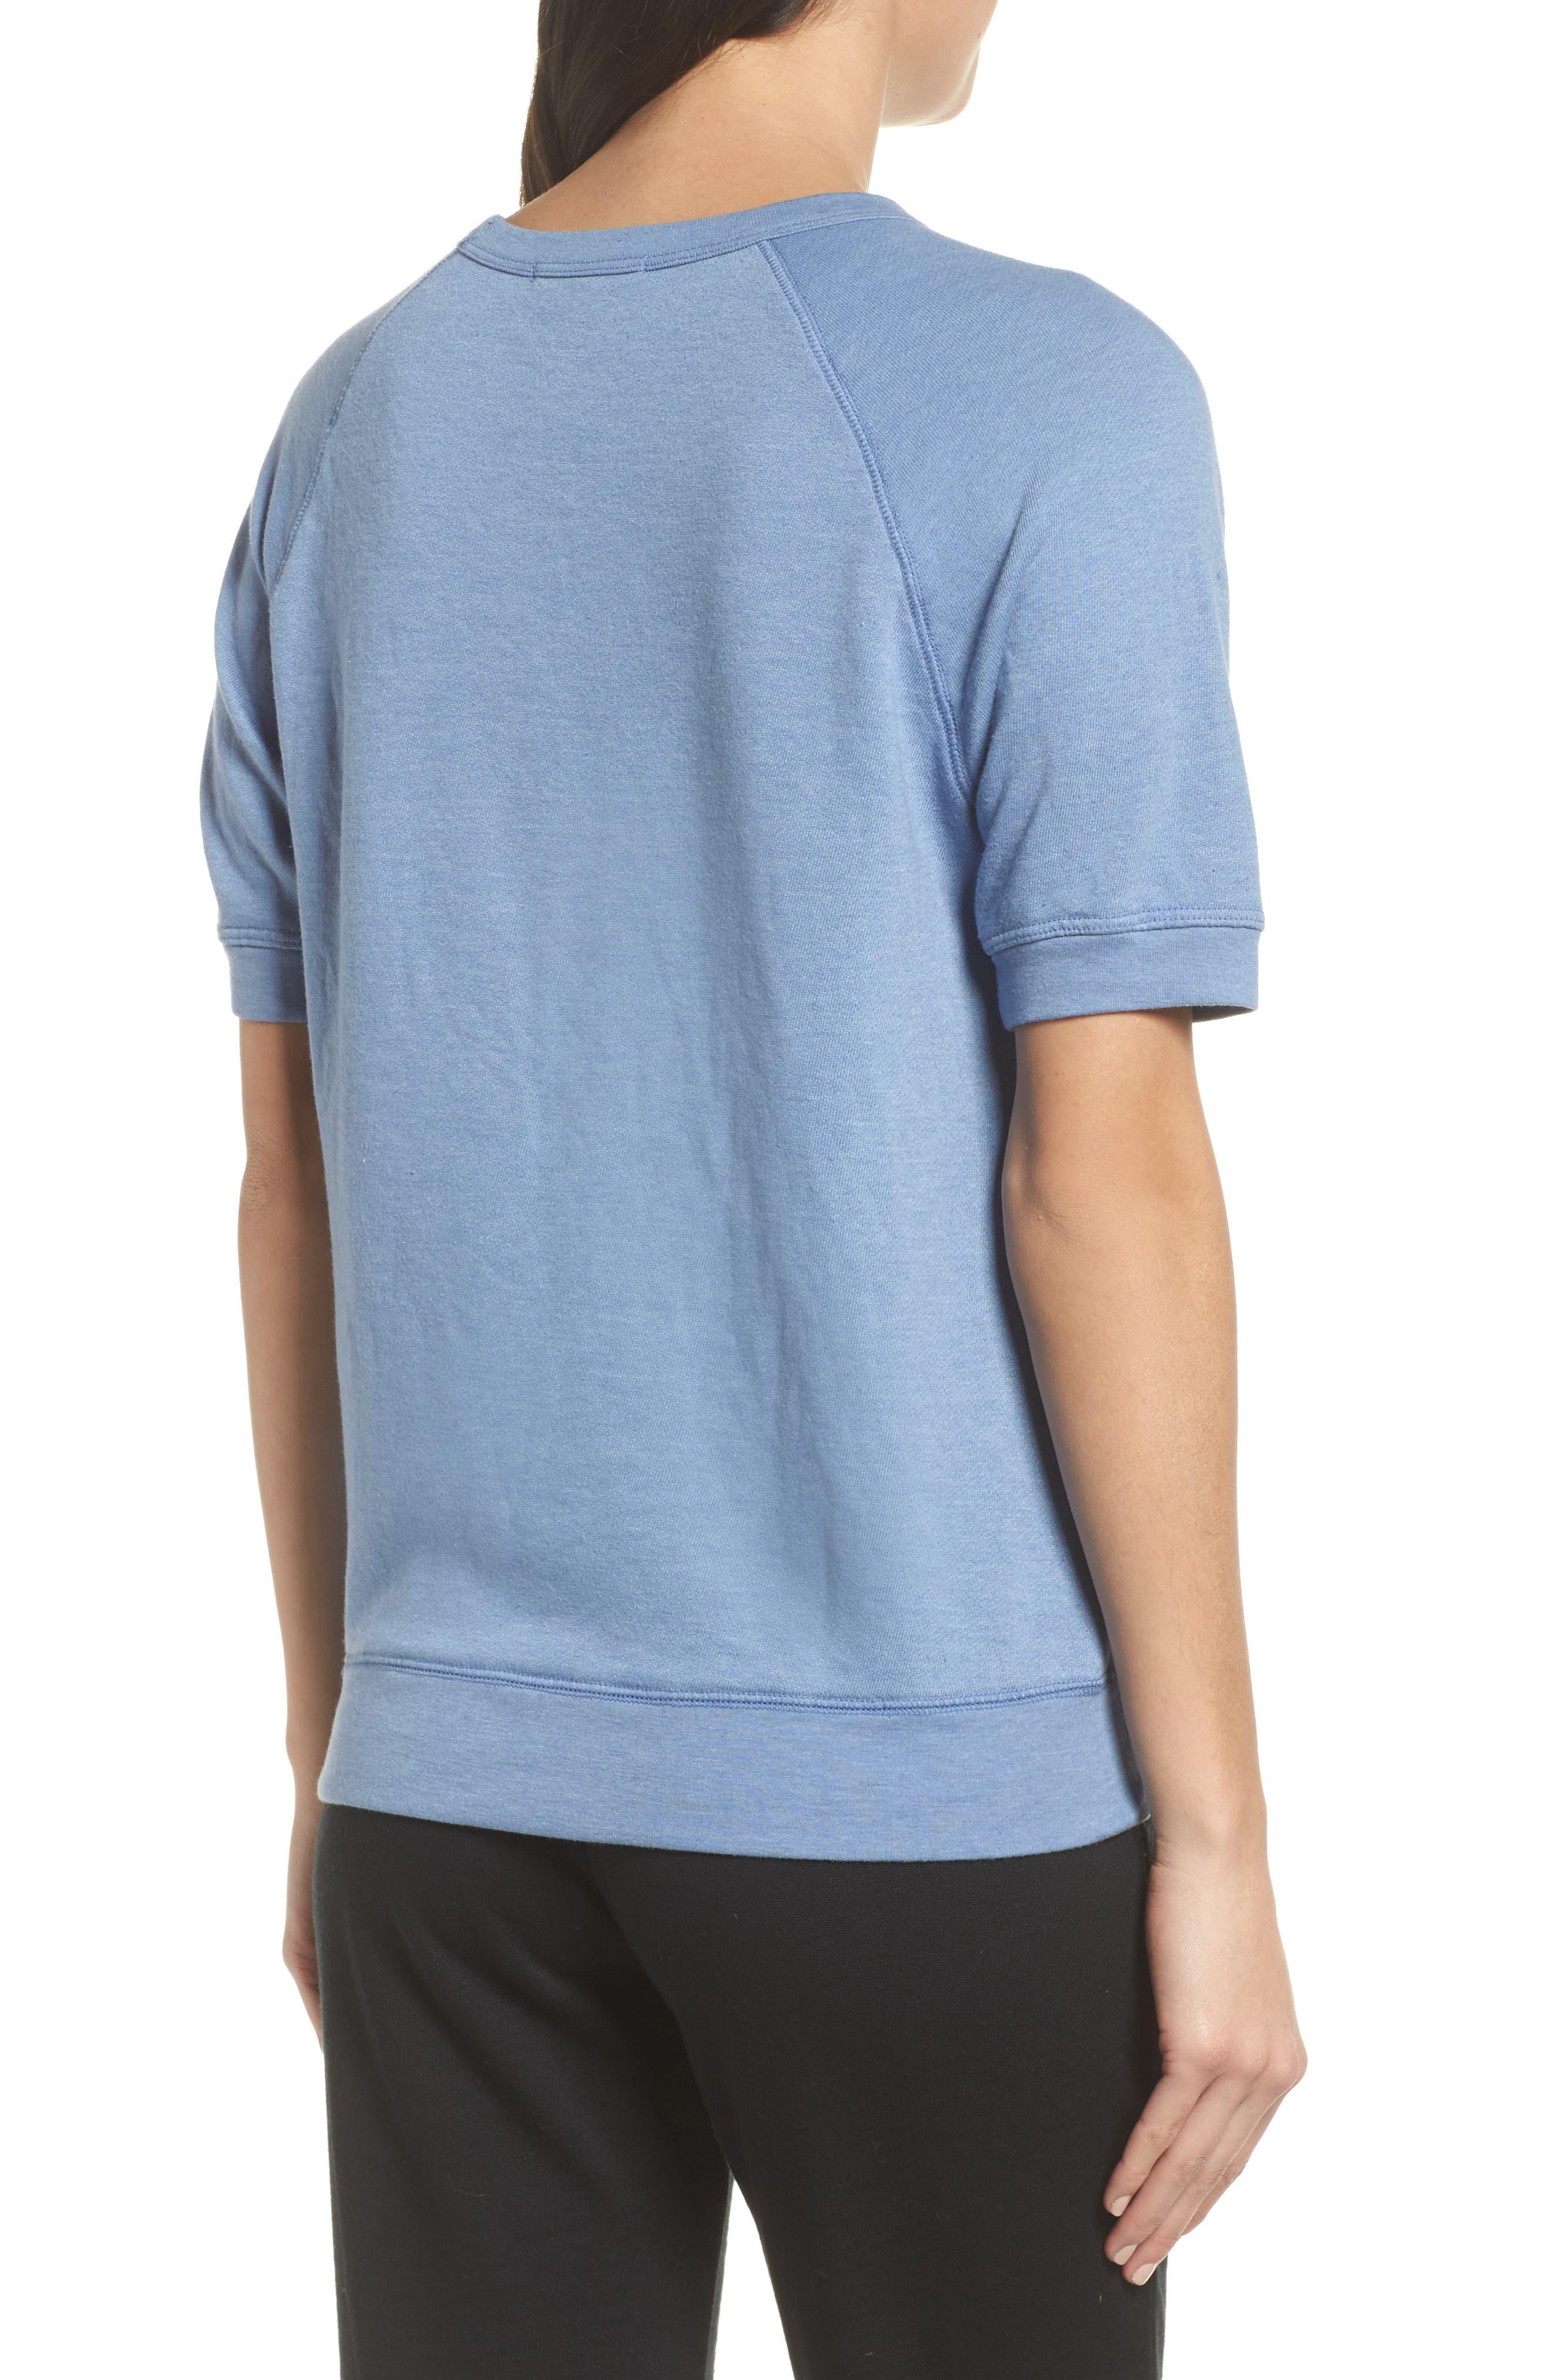 Alternate Image 2  - Junk Food Forever Short Sleeve Sweatshirt (Nordstrom Exclusive)